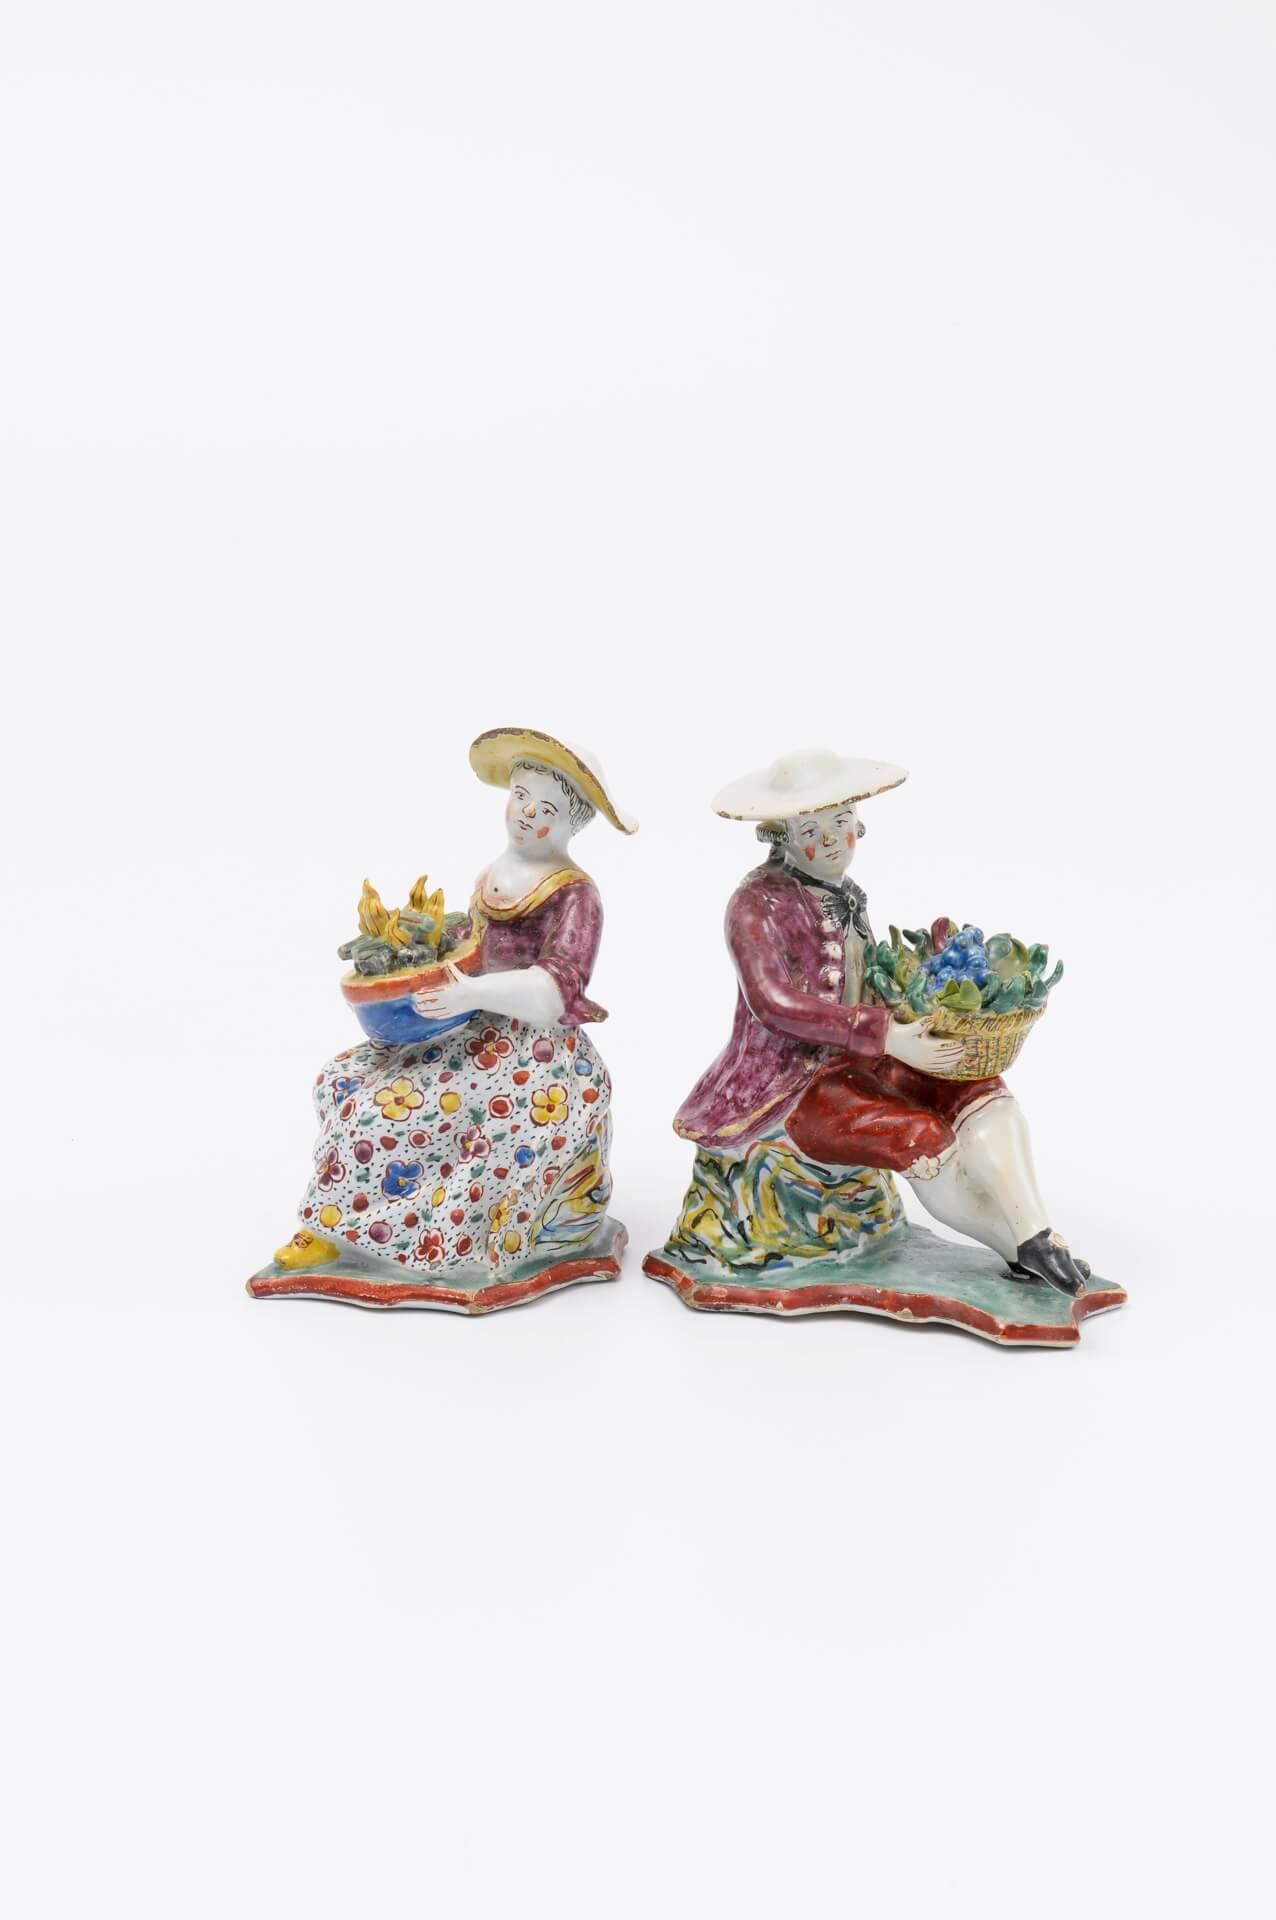 Antique petit feu figures of delftware Aronson Antiquairs